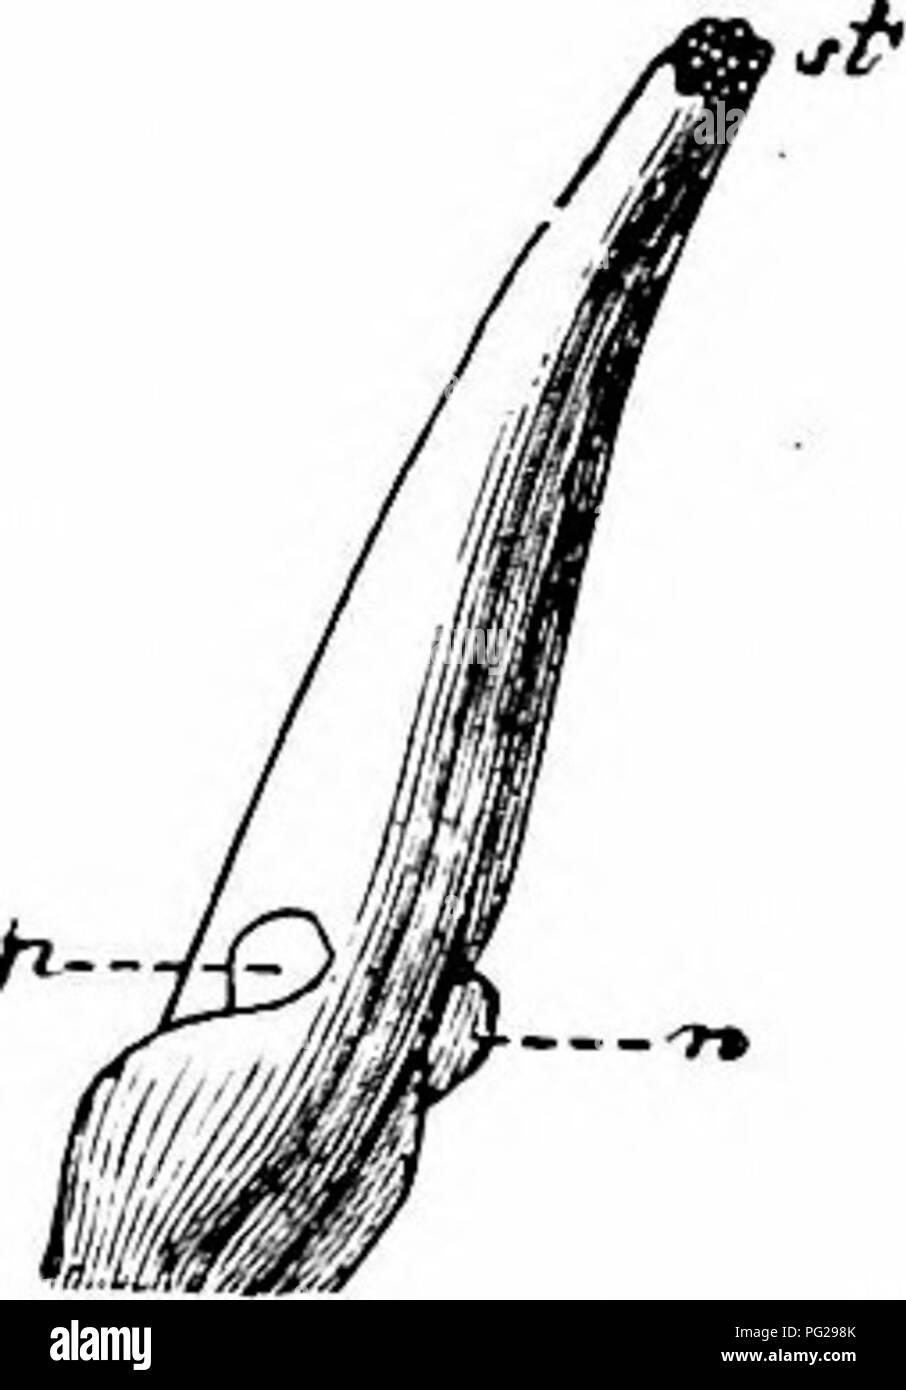 . Handbook of flower pollination : based upon Hermann MuÌller's work 'The fertilisation of flowers by insects' . Fertilization of plants. 34 ANGIOSPERMAEâDICOTYLEDONES 75. C. palustris L. (Knuth, 'Bl. u. Insekt. a. d. nordfr. Ins.,' p. 147; Sprengel, ' Entd. Geh.,' p. 298; Herm. Miiller, 'Fertilisation,' pp. 79-80, ' Weit. Beob.,' p. 322, ' Alpenblumen,' pp. 135-6; Kirchner, 'Flora v. Stuttgart,' p. 270; Beyer, ' D. spont. Bewegungen d. Staubgefasse u. Stempel'; Schulz, ' Beitrage,' 11, p. 179; Haussknecht, Mitt, geogr. Ges., Jena, vi, 1887.)âIn the large egg-yolk yellow flowersâwhich spread o - Stock Image